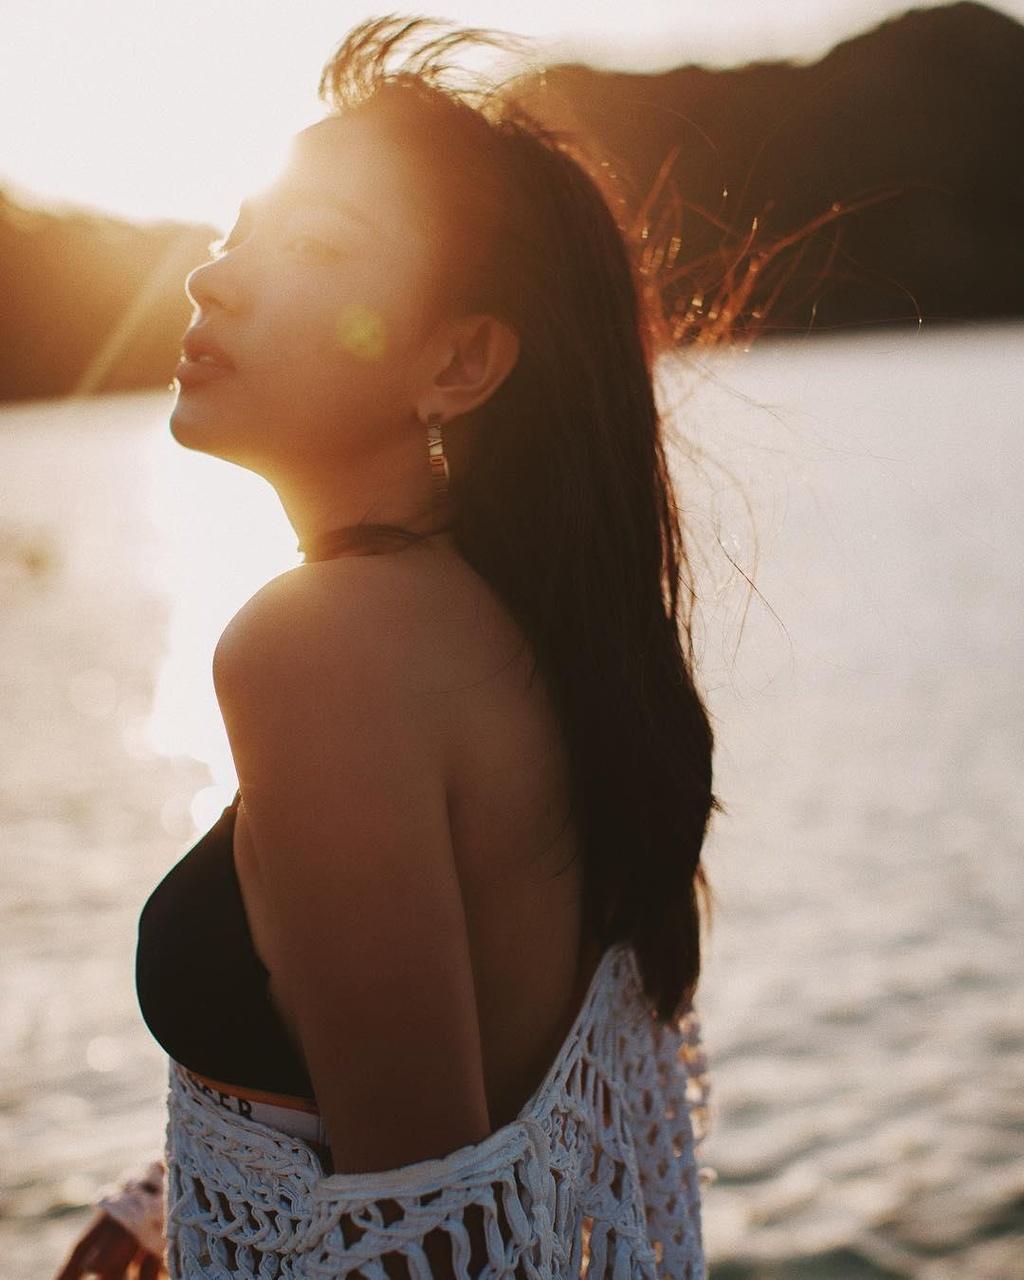 Hoc Jun Vu, Chi Pu cach tao dang voi bikini khi di du lich bien hinh anh 10